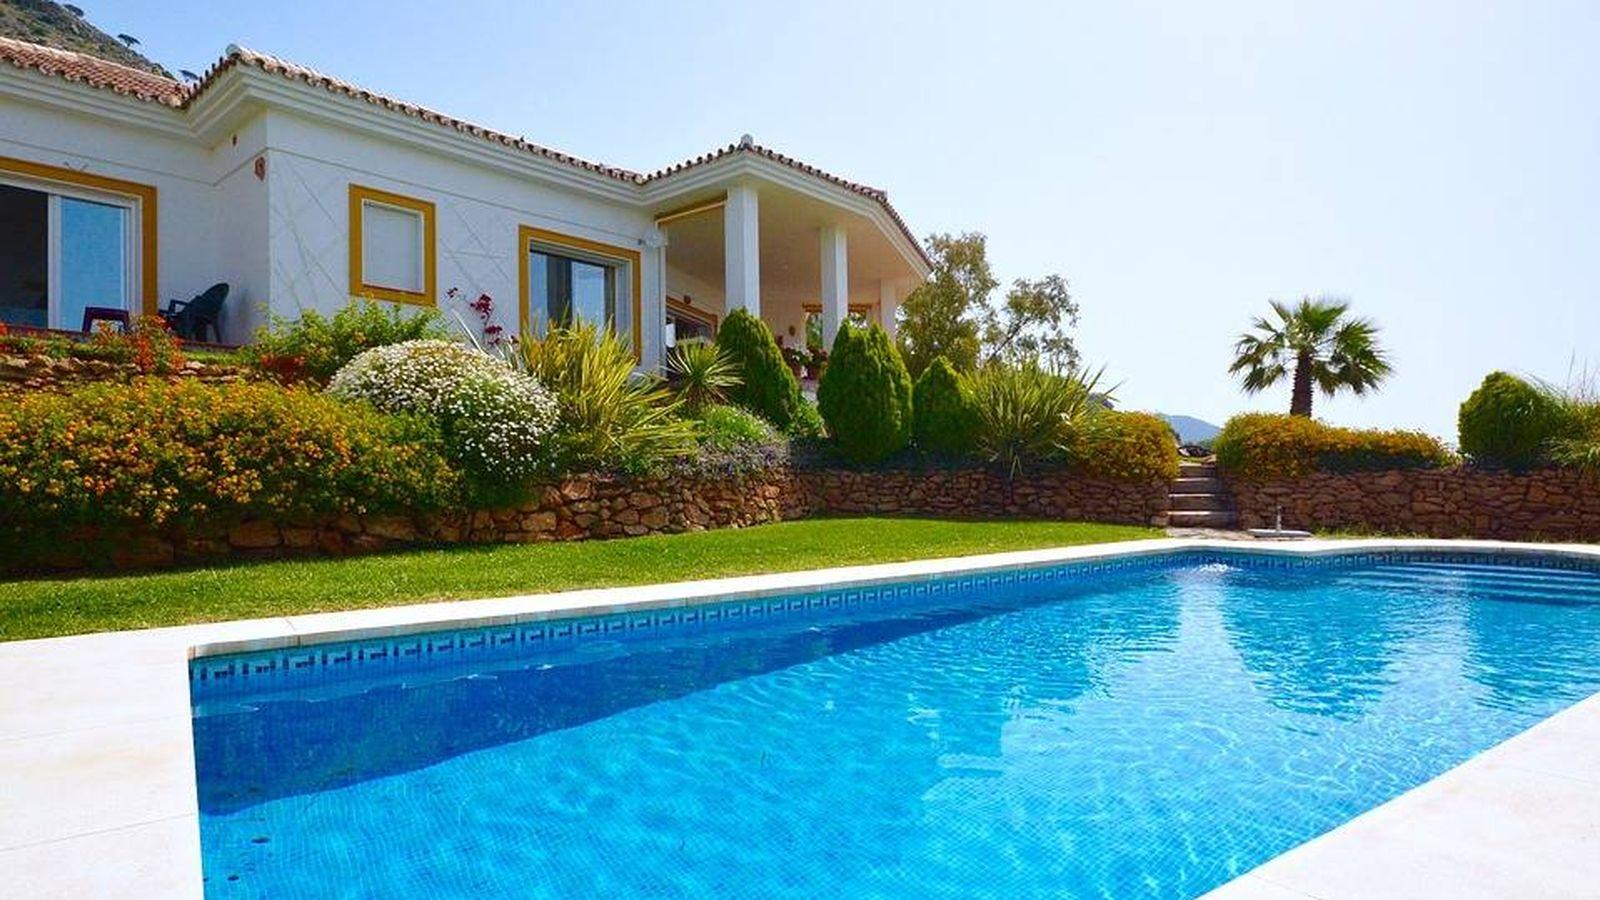 Foto: Villa de lujo (Pixabay)